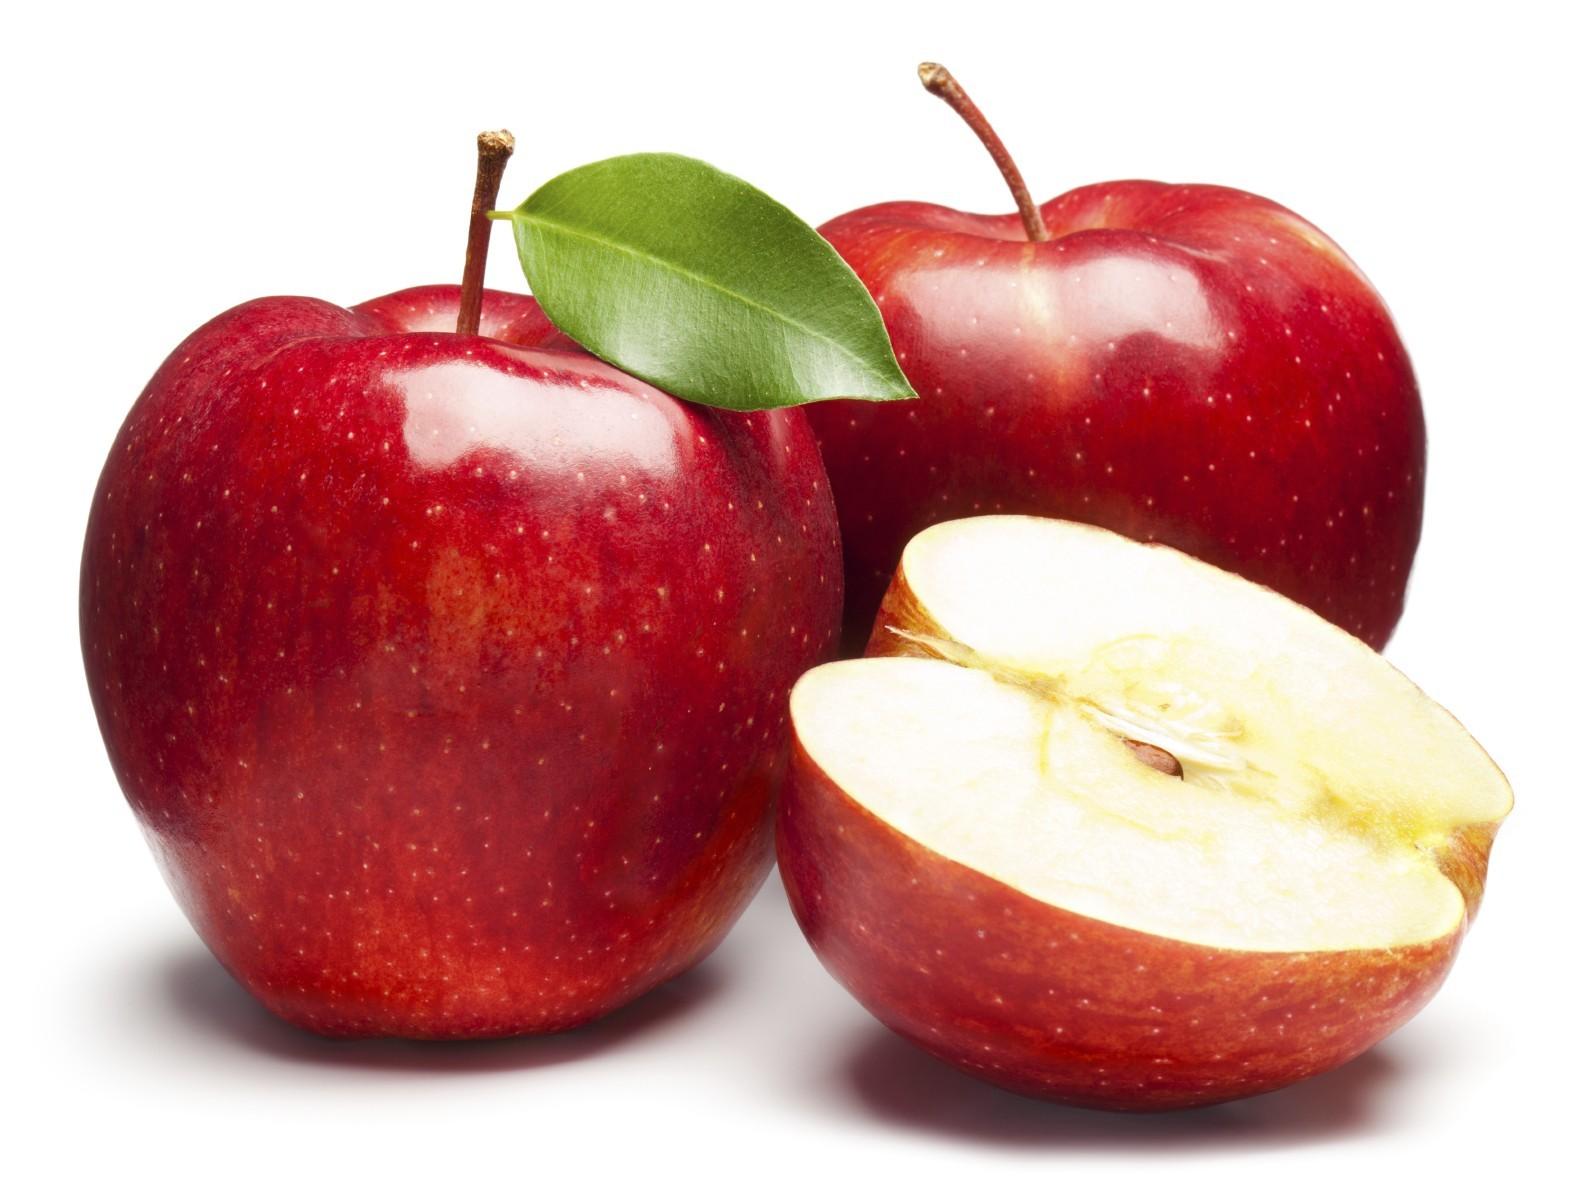 04 apples